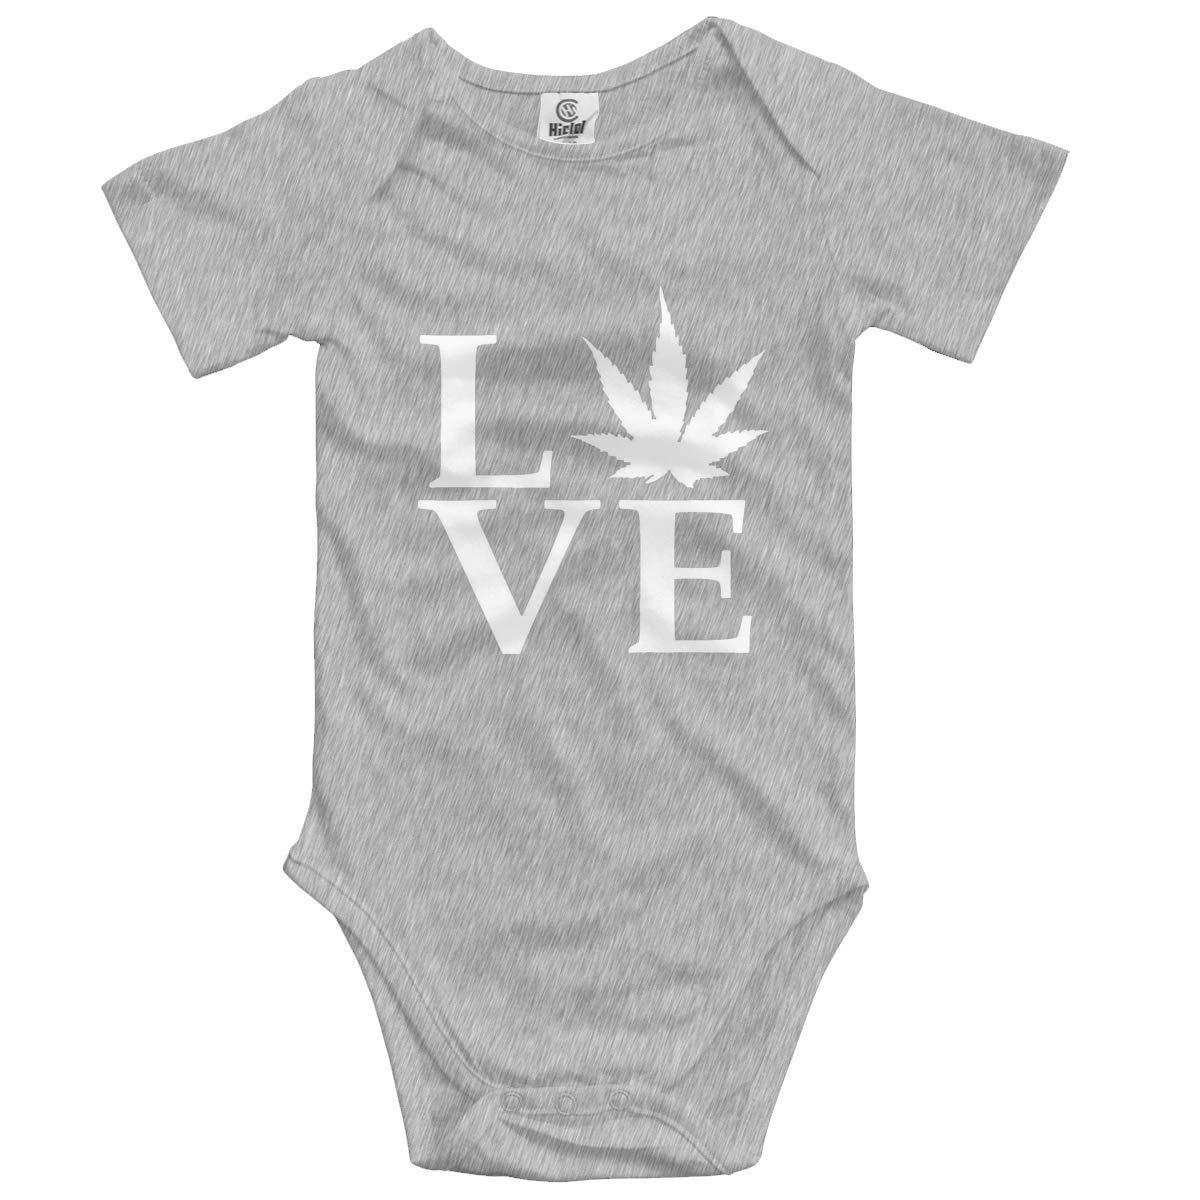 Love Pot Weed Pot Leaf Baby Romper 0-18 Months Newborn Baby Girls Boys Layette Rompers Black